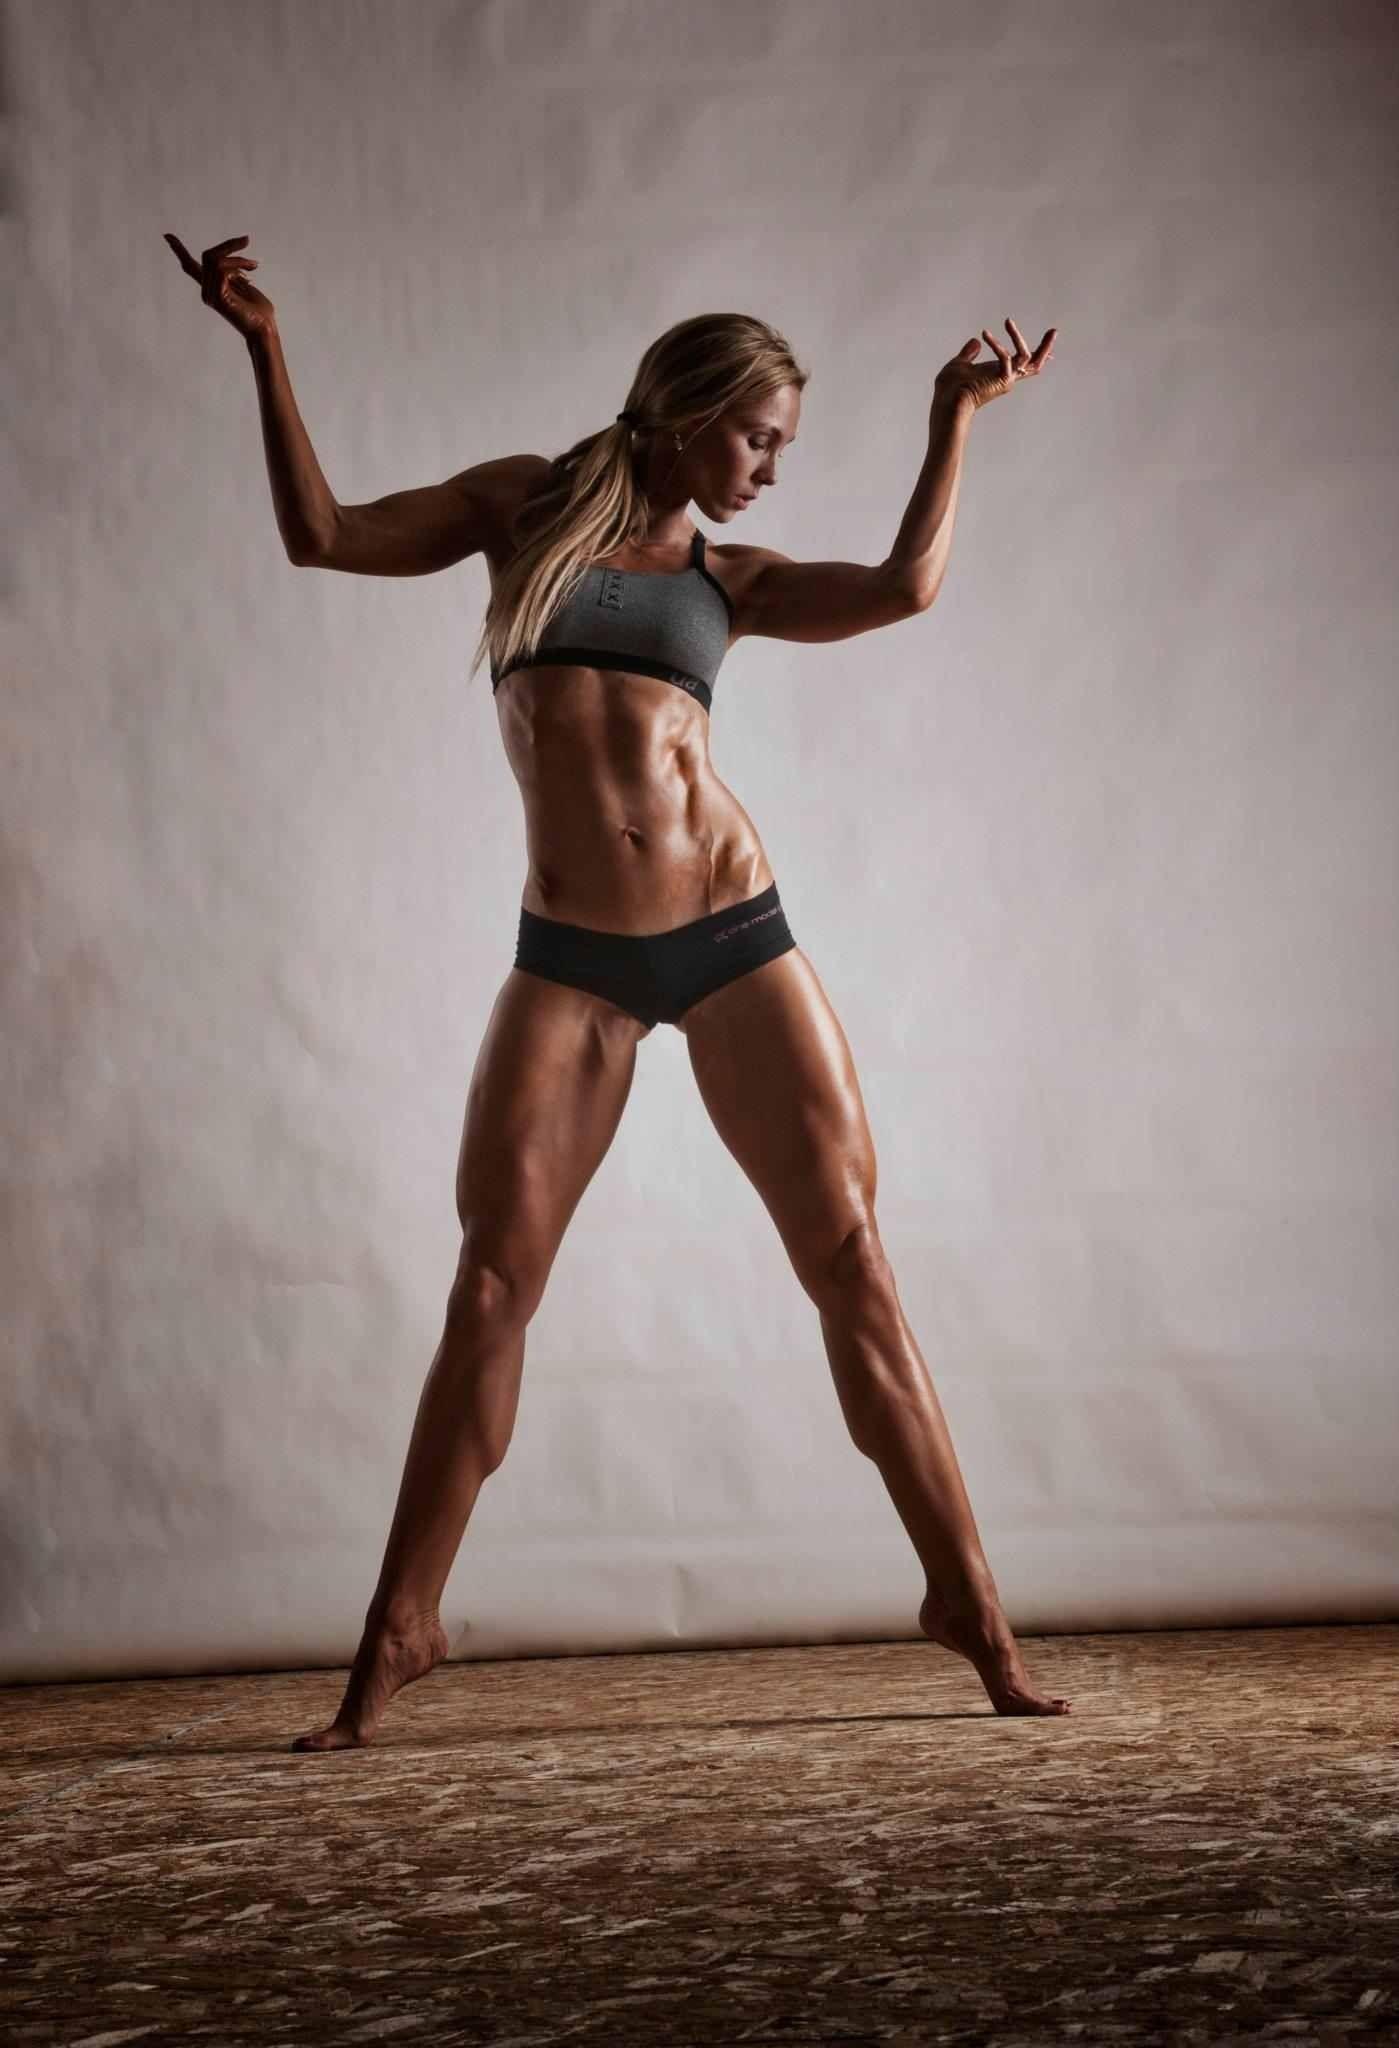 Fitness bikini women — pic 7